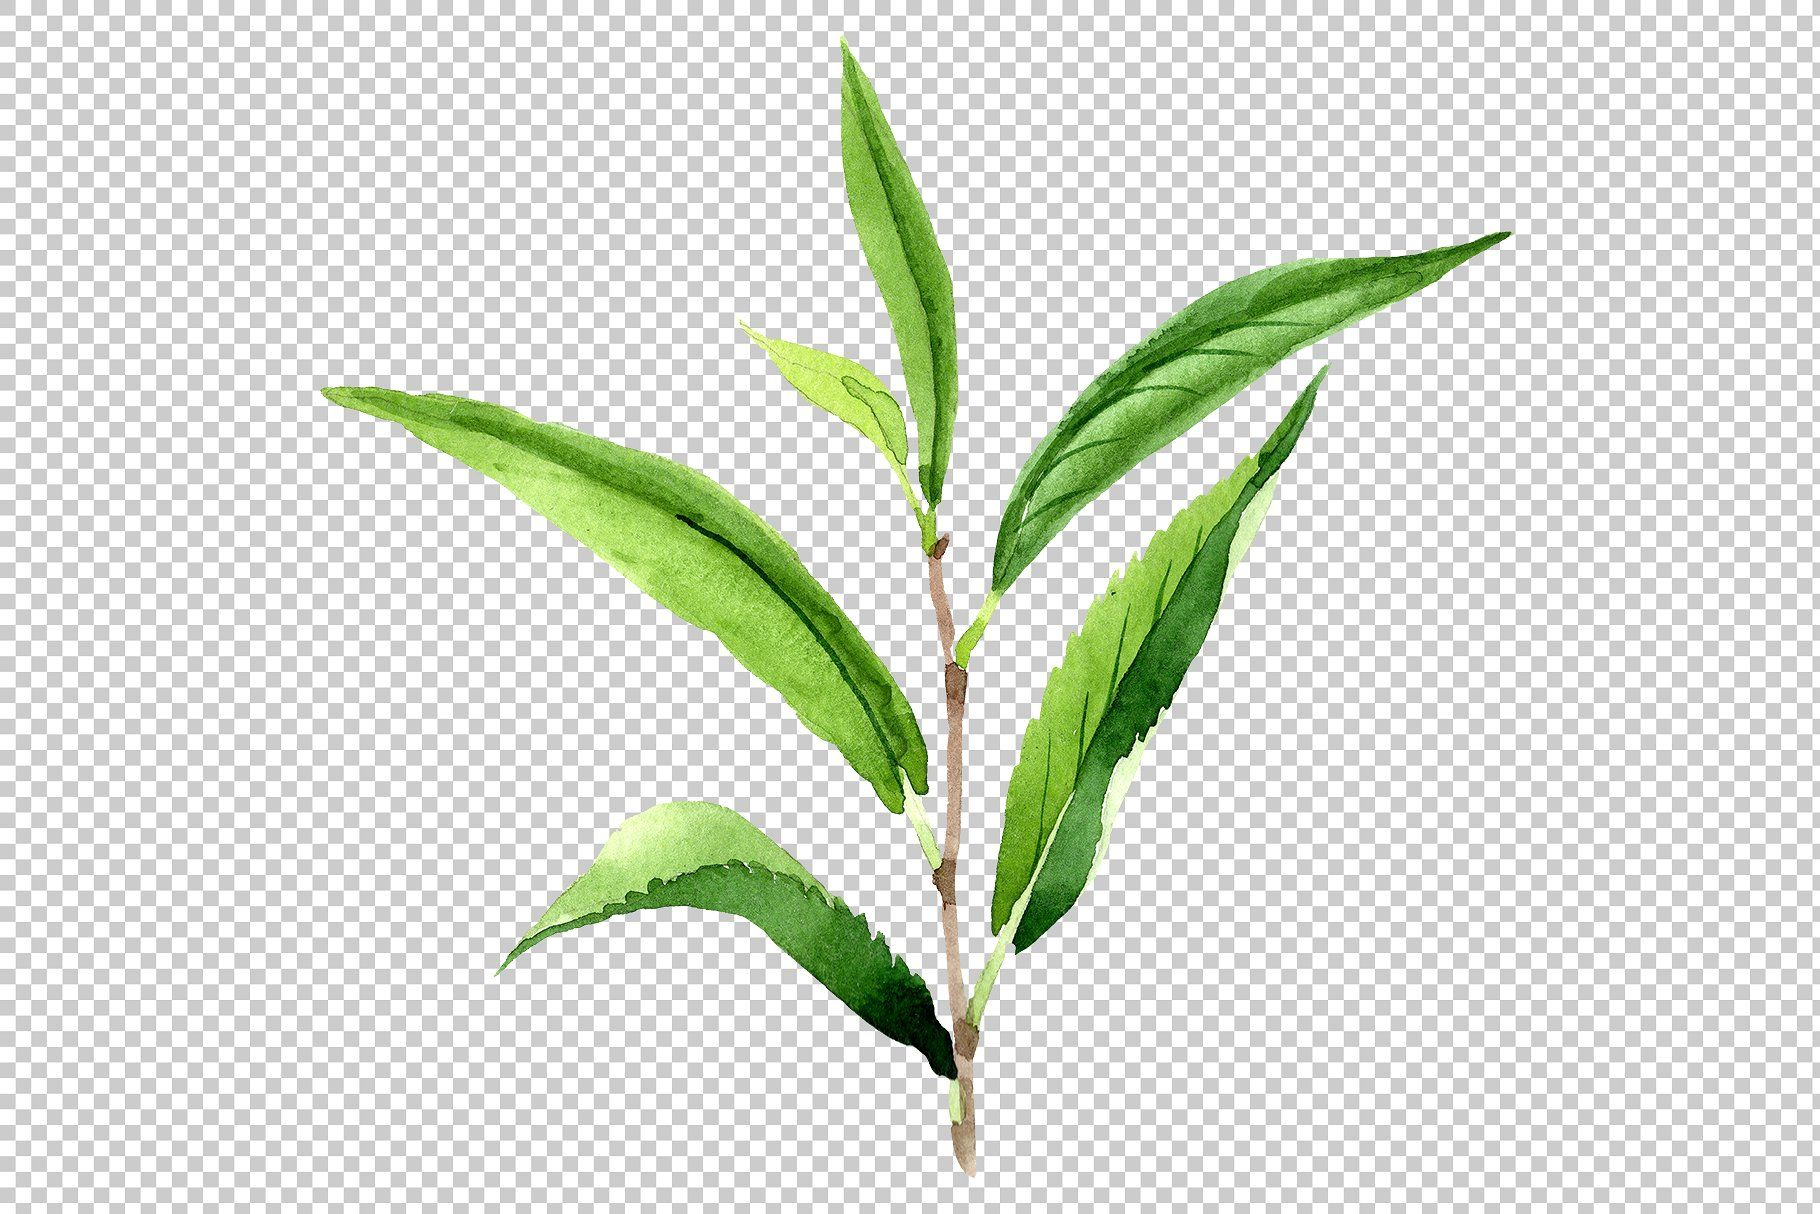 Tea Leaf Png Watercolor Set Tea Leaves Illustration Leaf Illustration Tea Leaves